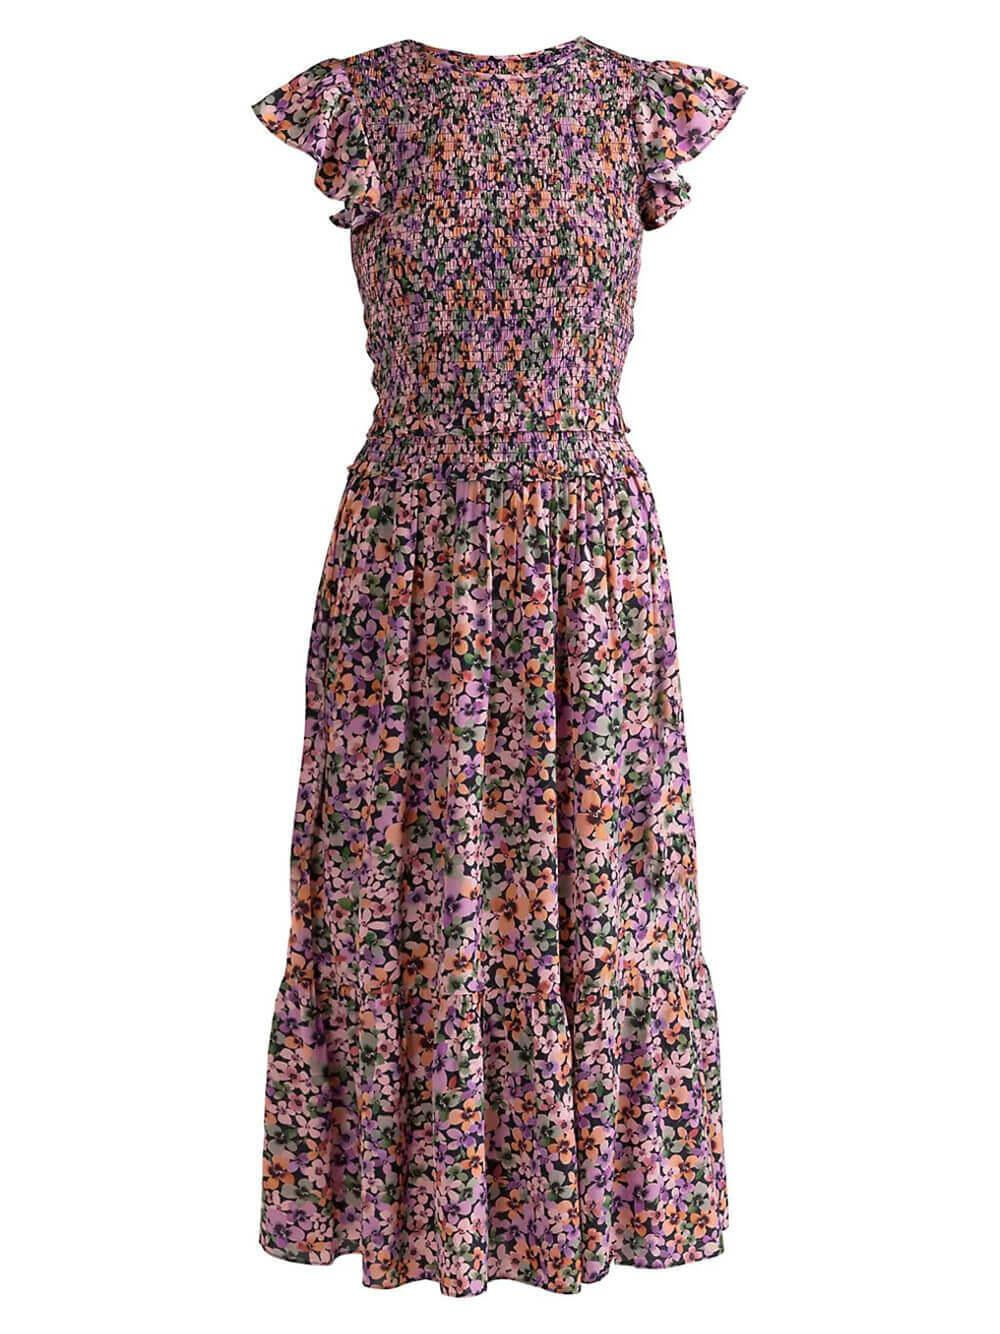 Parker Dress Item # 6149276